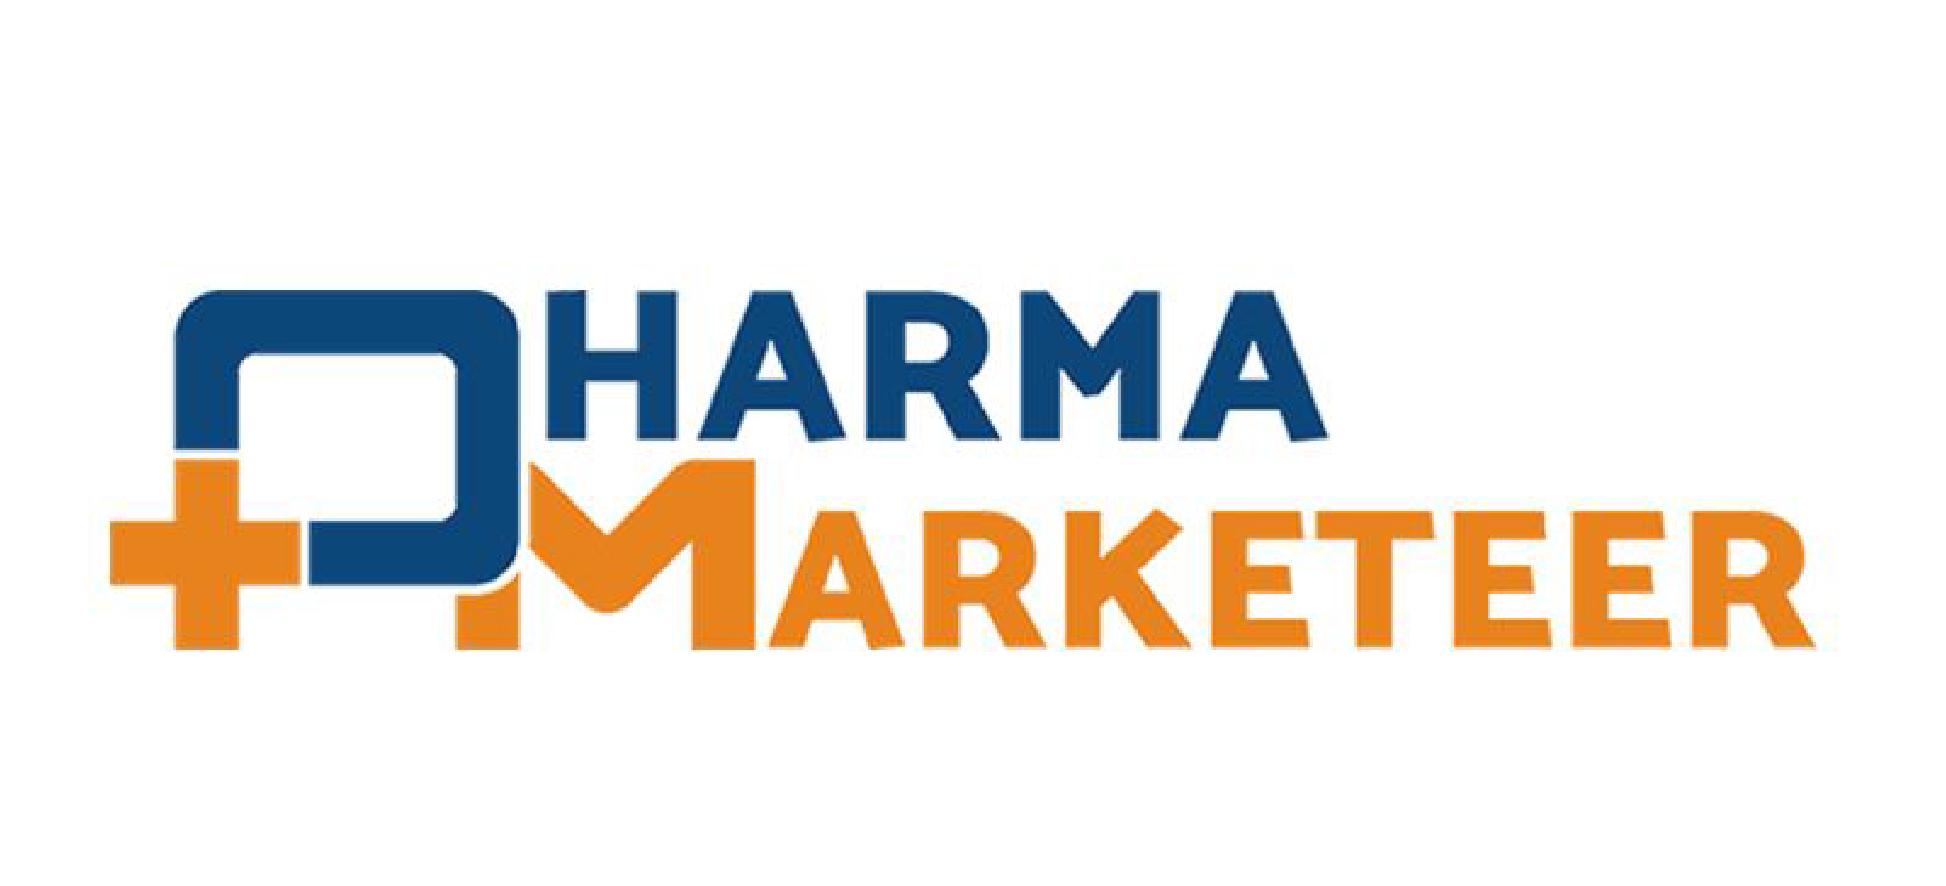 Pharma Marketeer